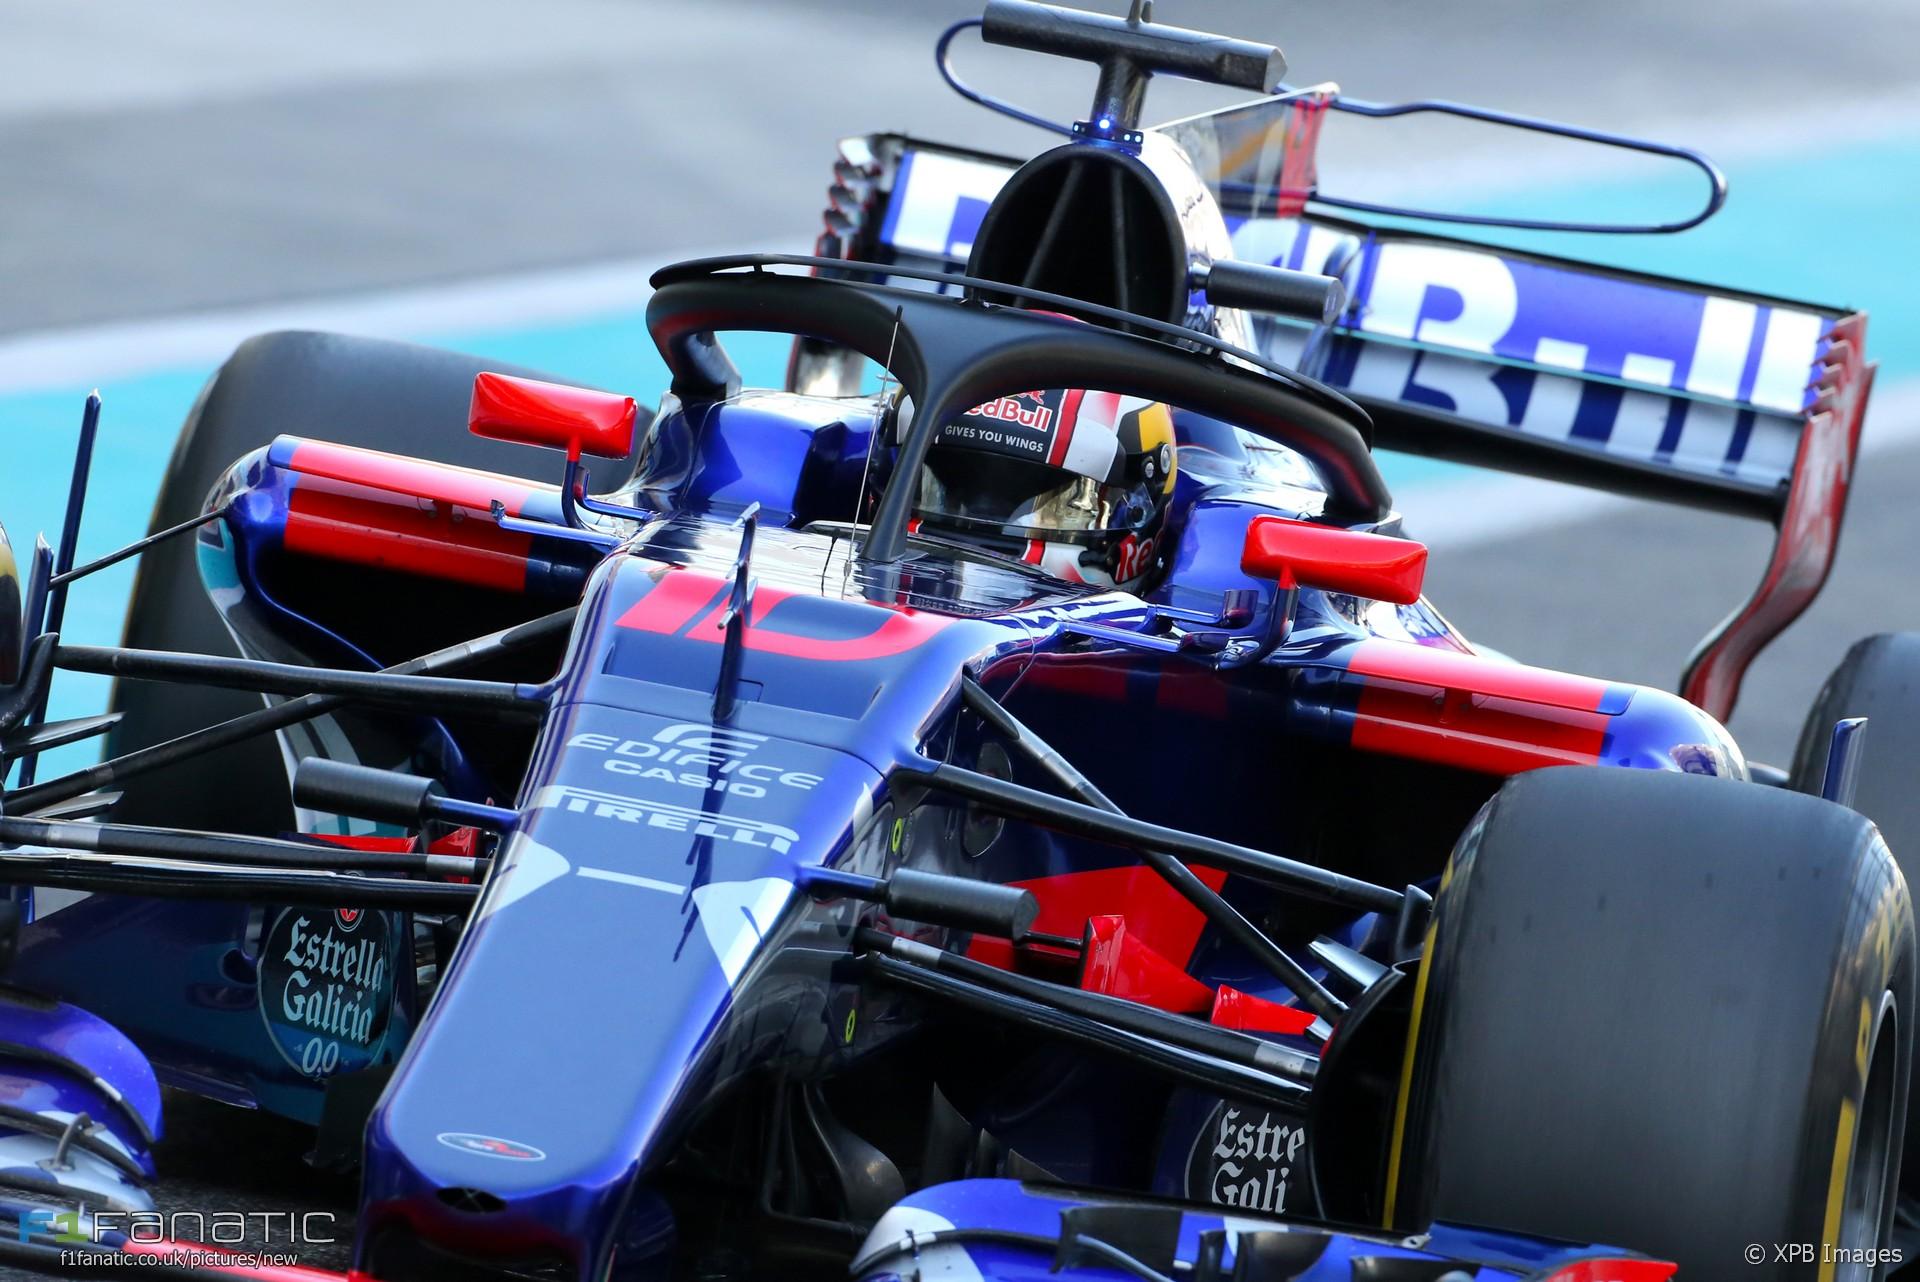 Pierre Gasly, Toro Rosso, Yas Marina, 2017